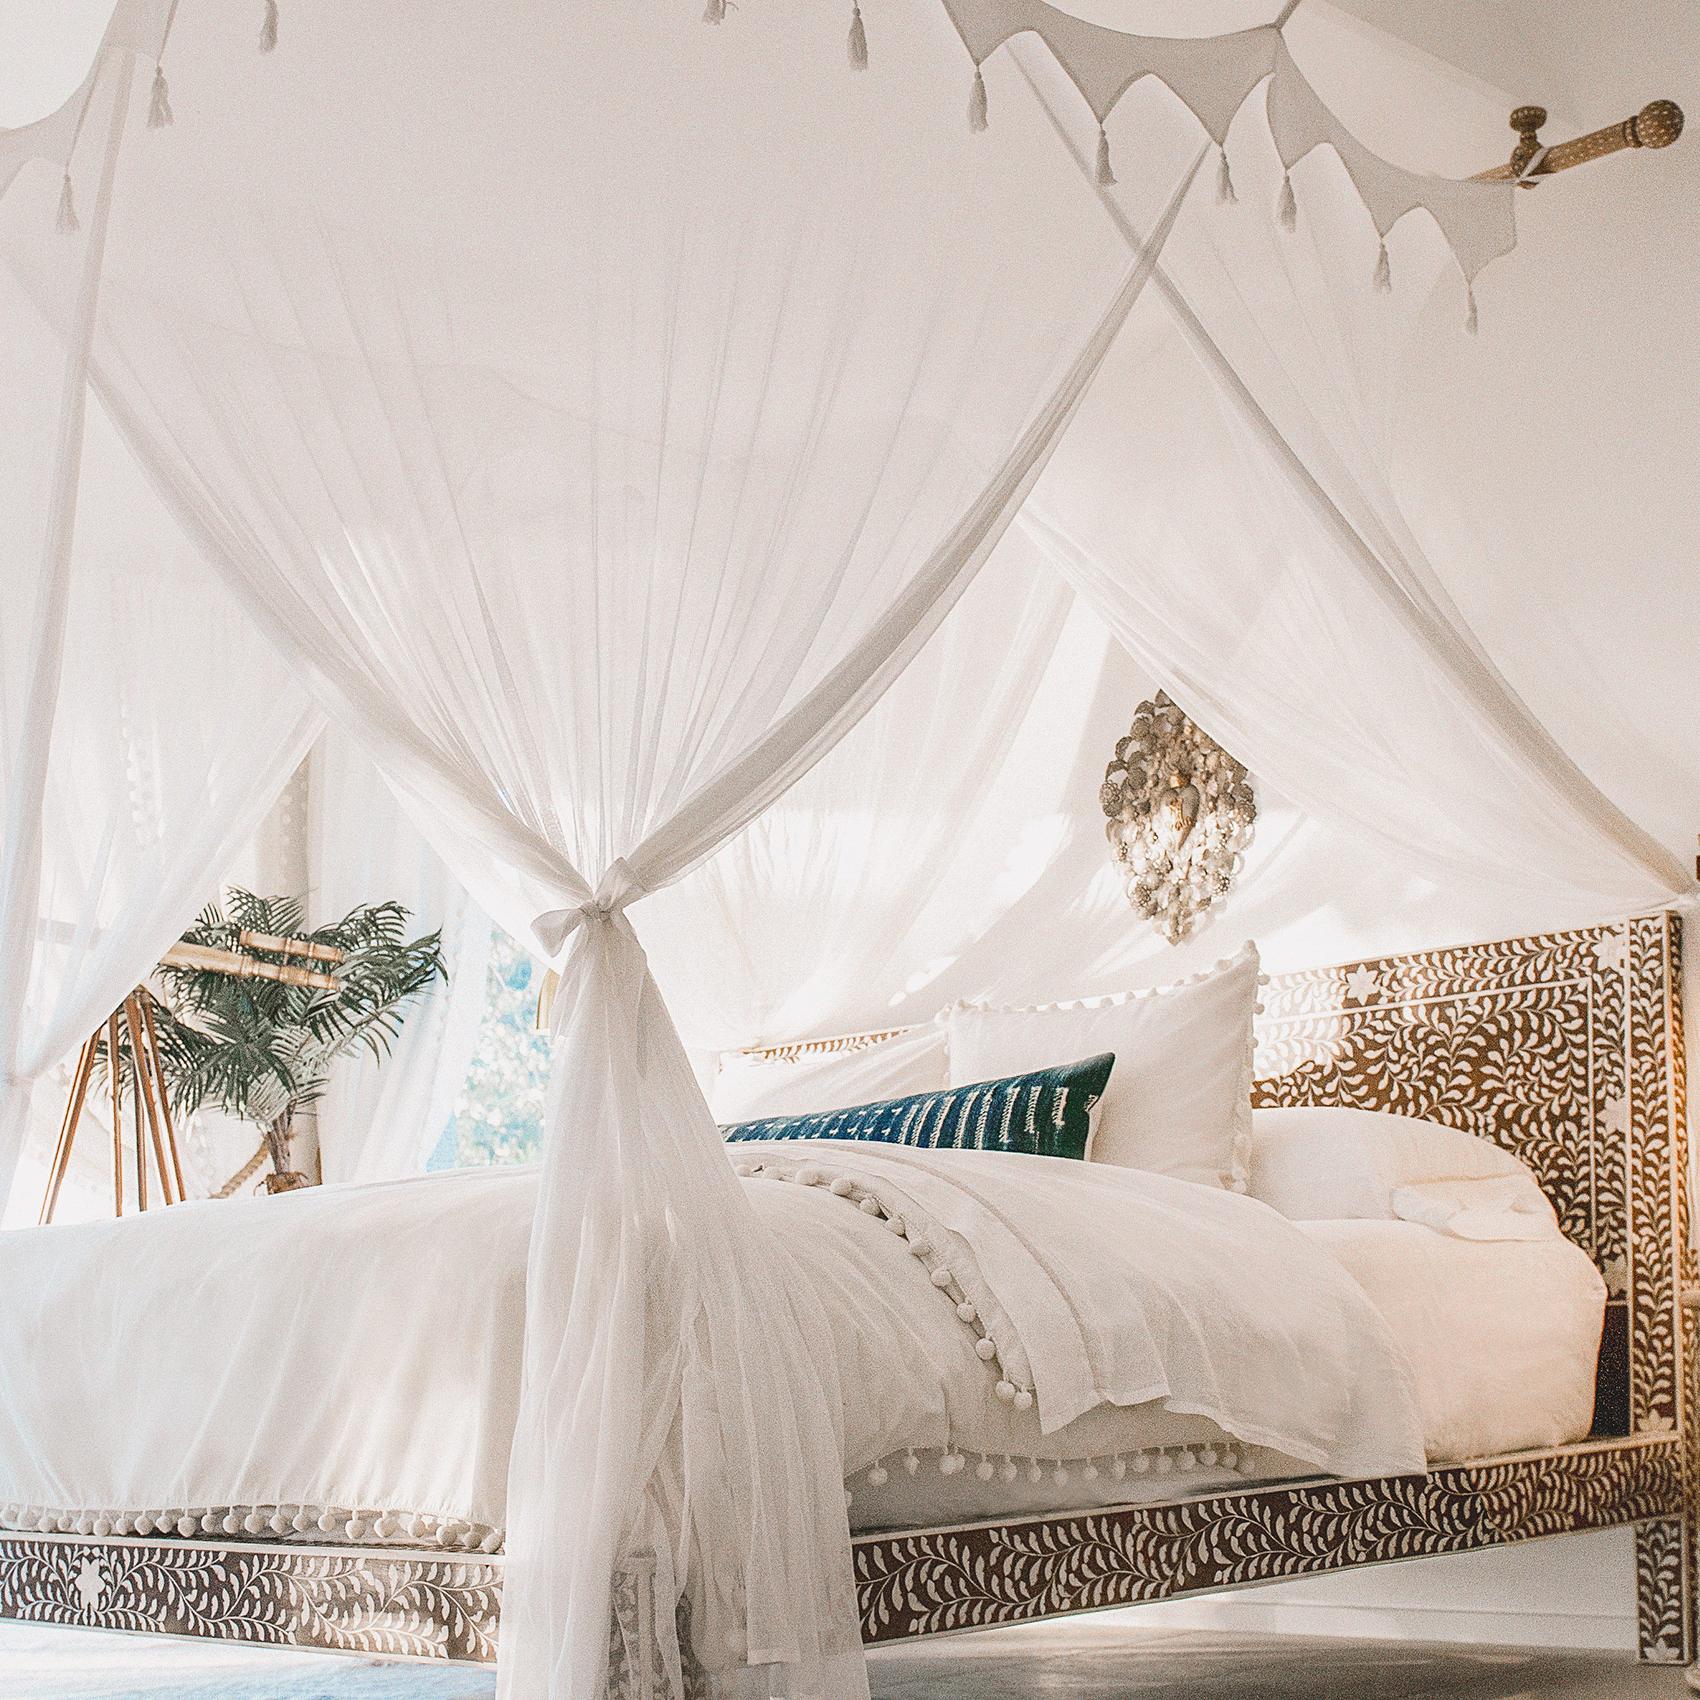 Sleeping Accommodations -